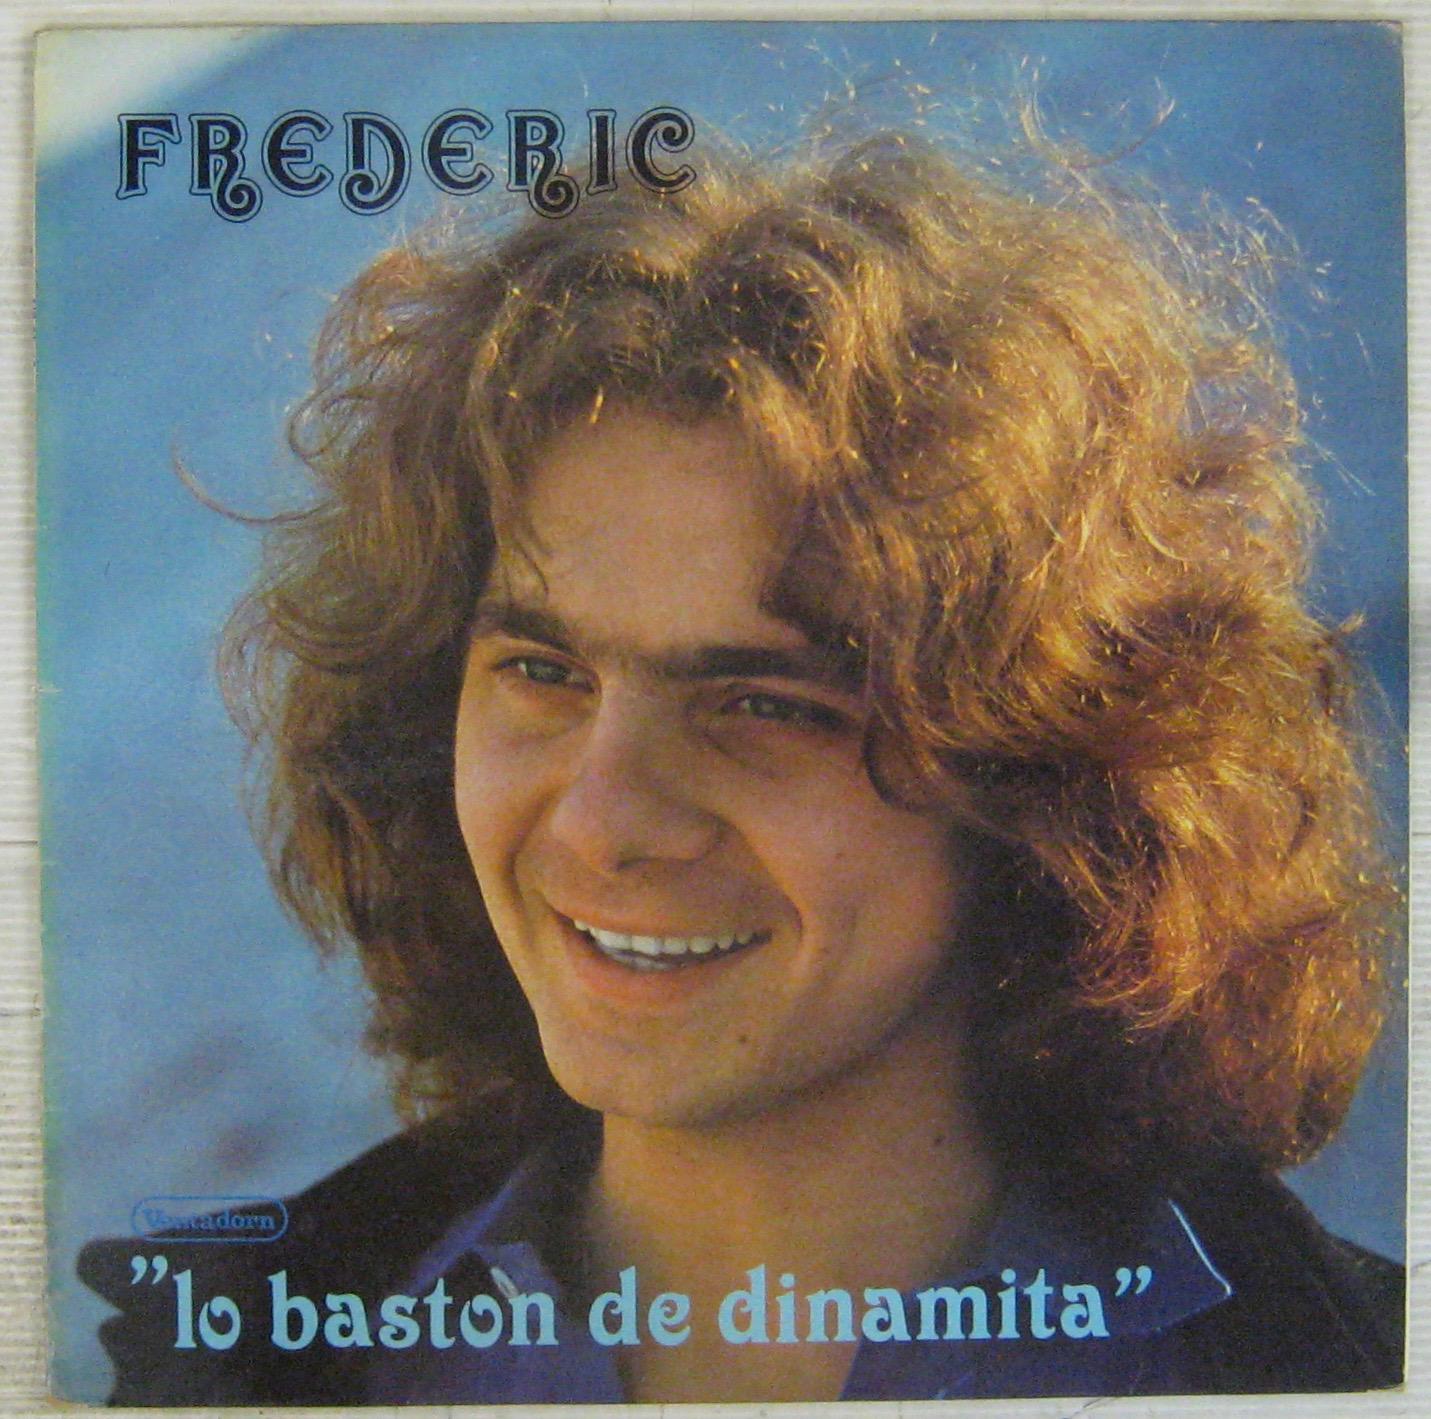 Frederic Lo baston de dinamita